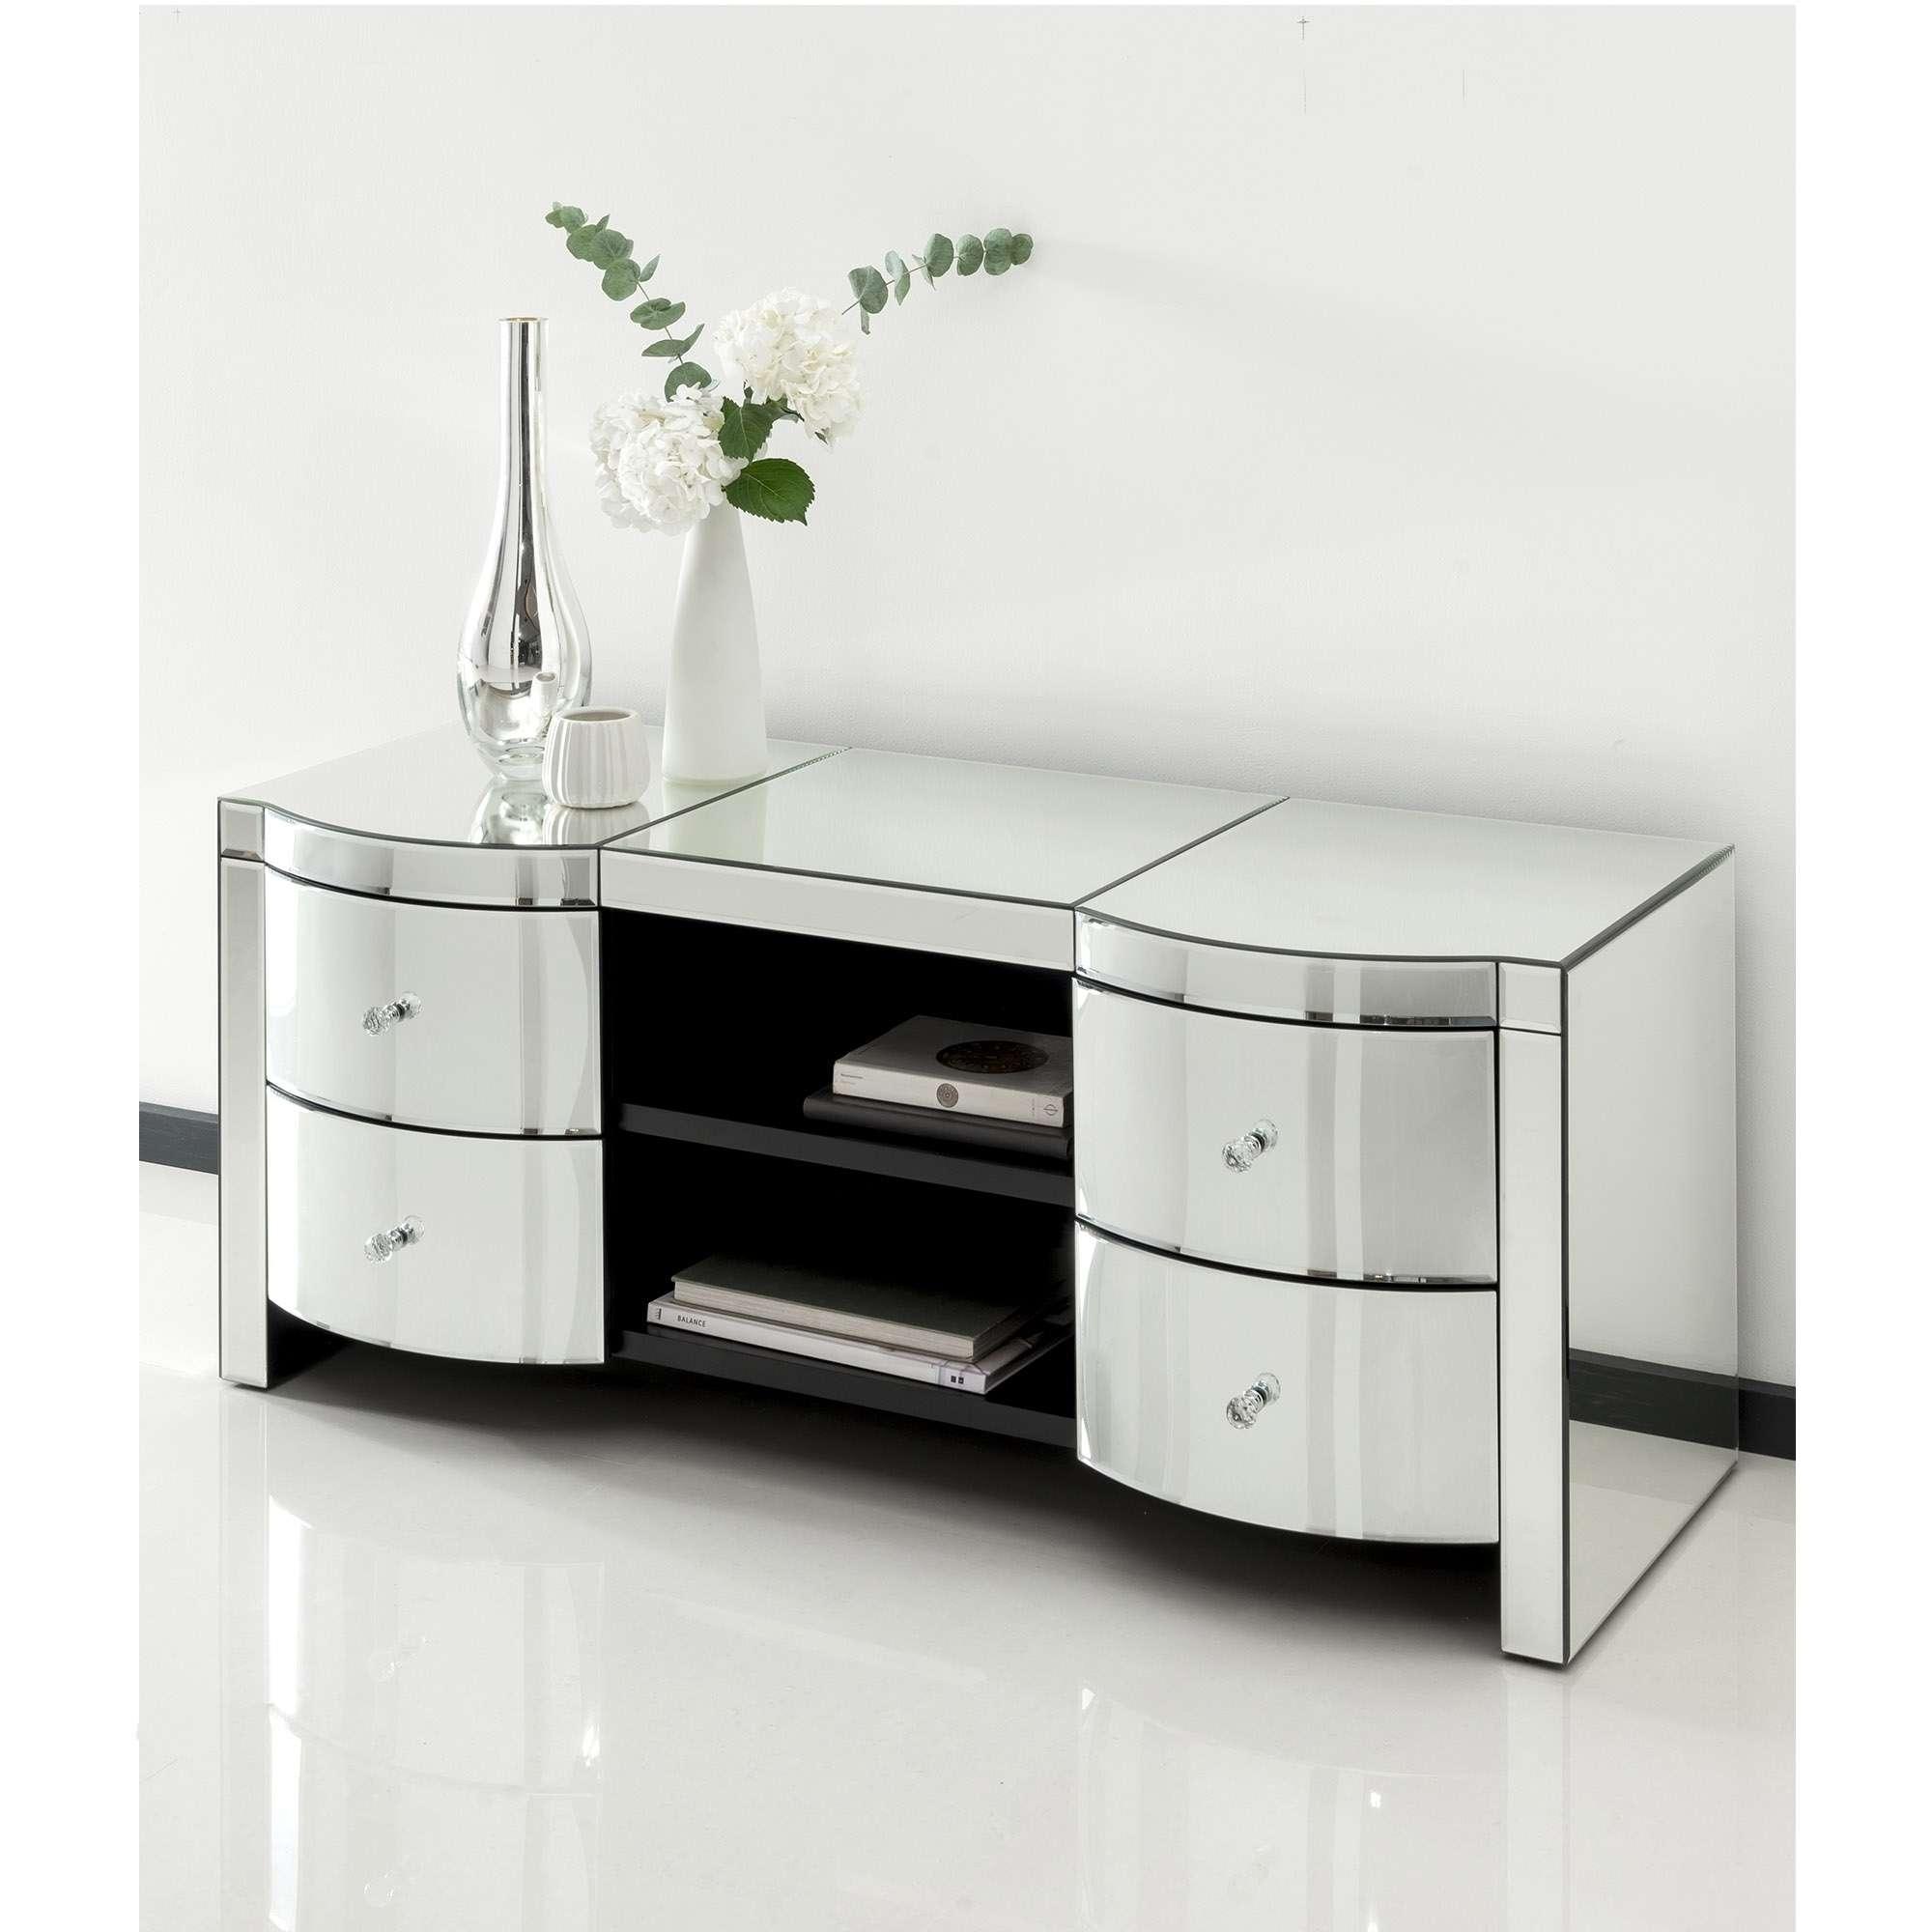 Romano Crystal Mirrored Tv Cabinet | Venetian Mirrored Furniture Regarding Mirror Tv Cabinets (View 4 of 20)